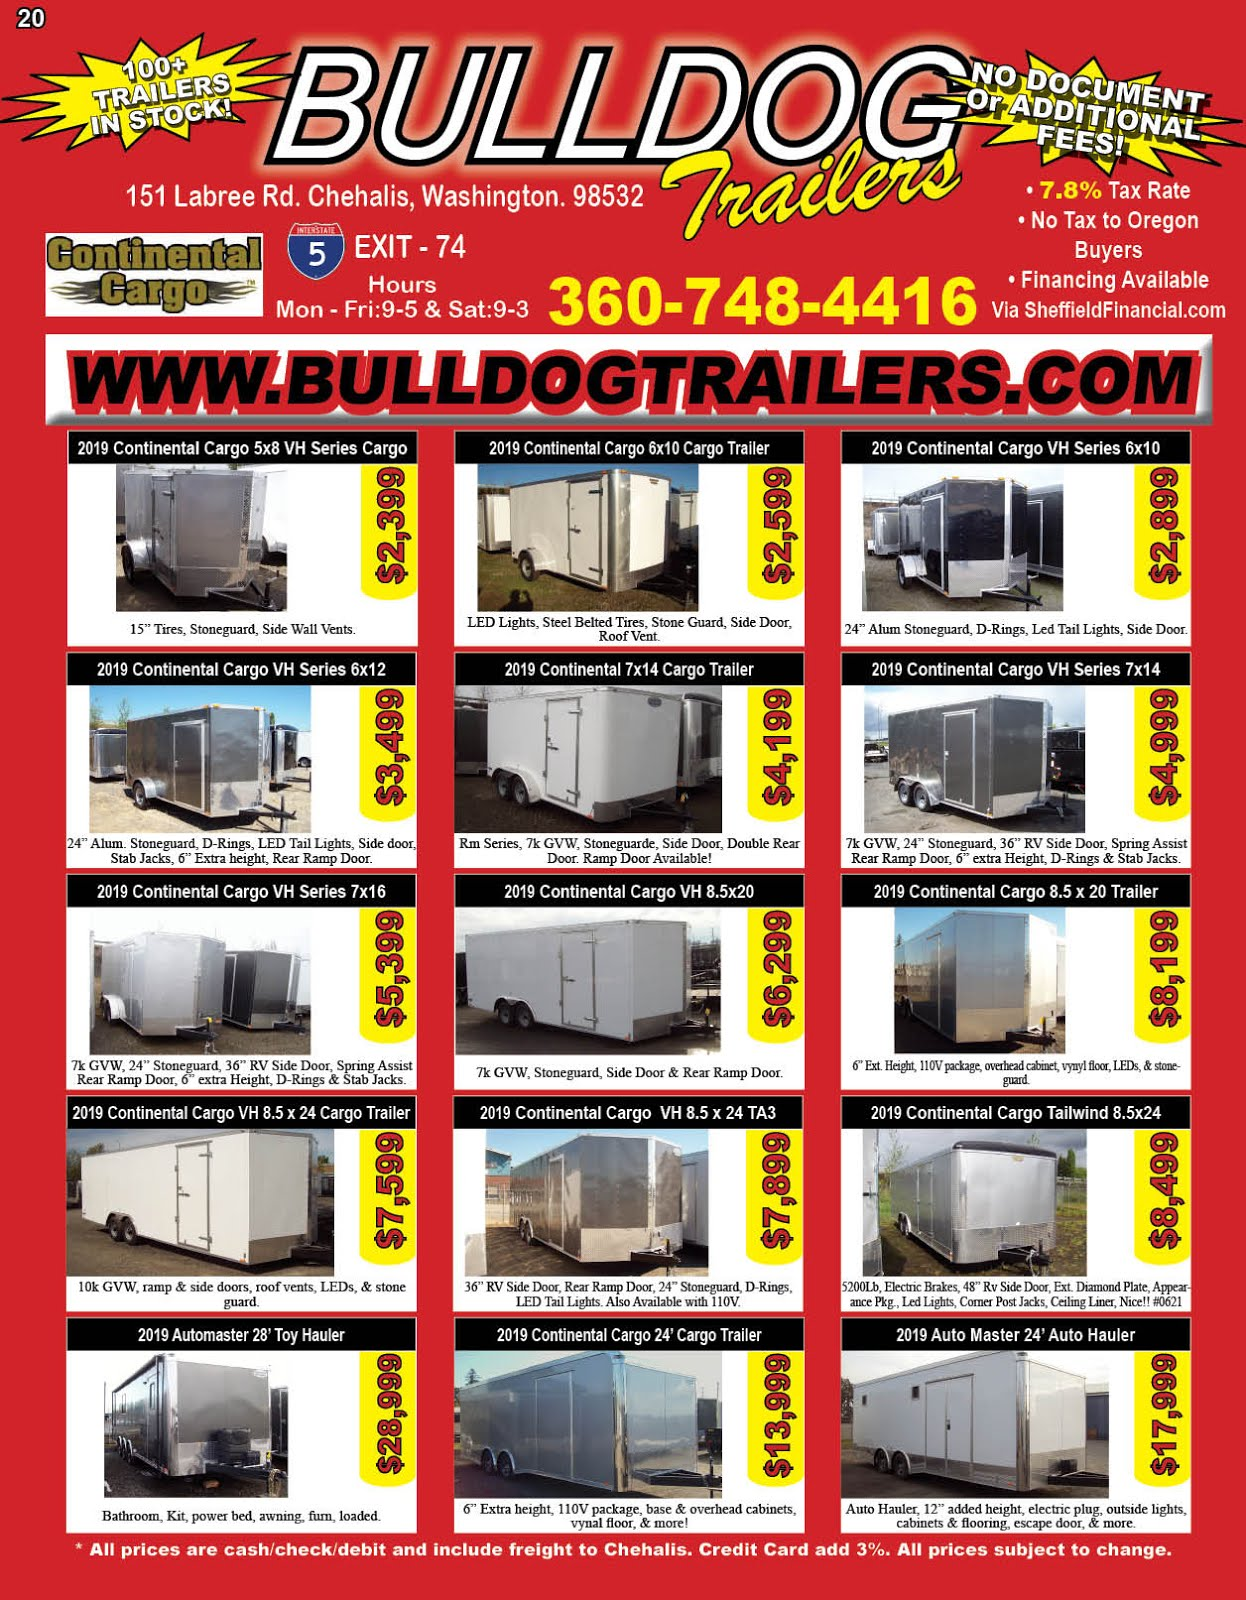 Bulldog Trailer Carries Continental Cargo Trailers!!